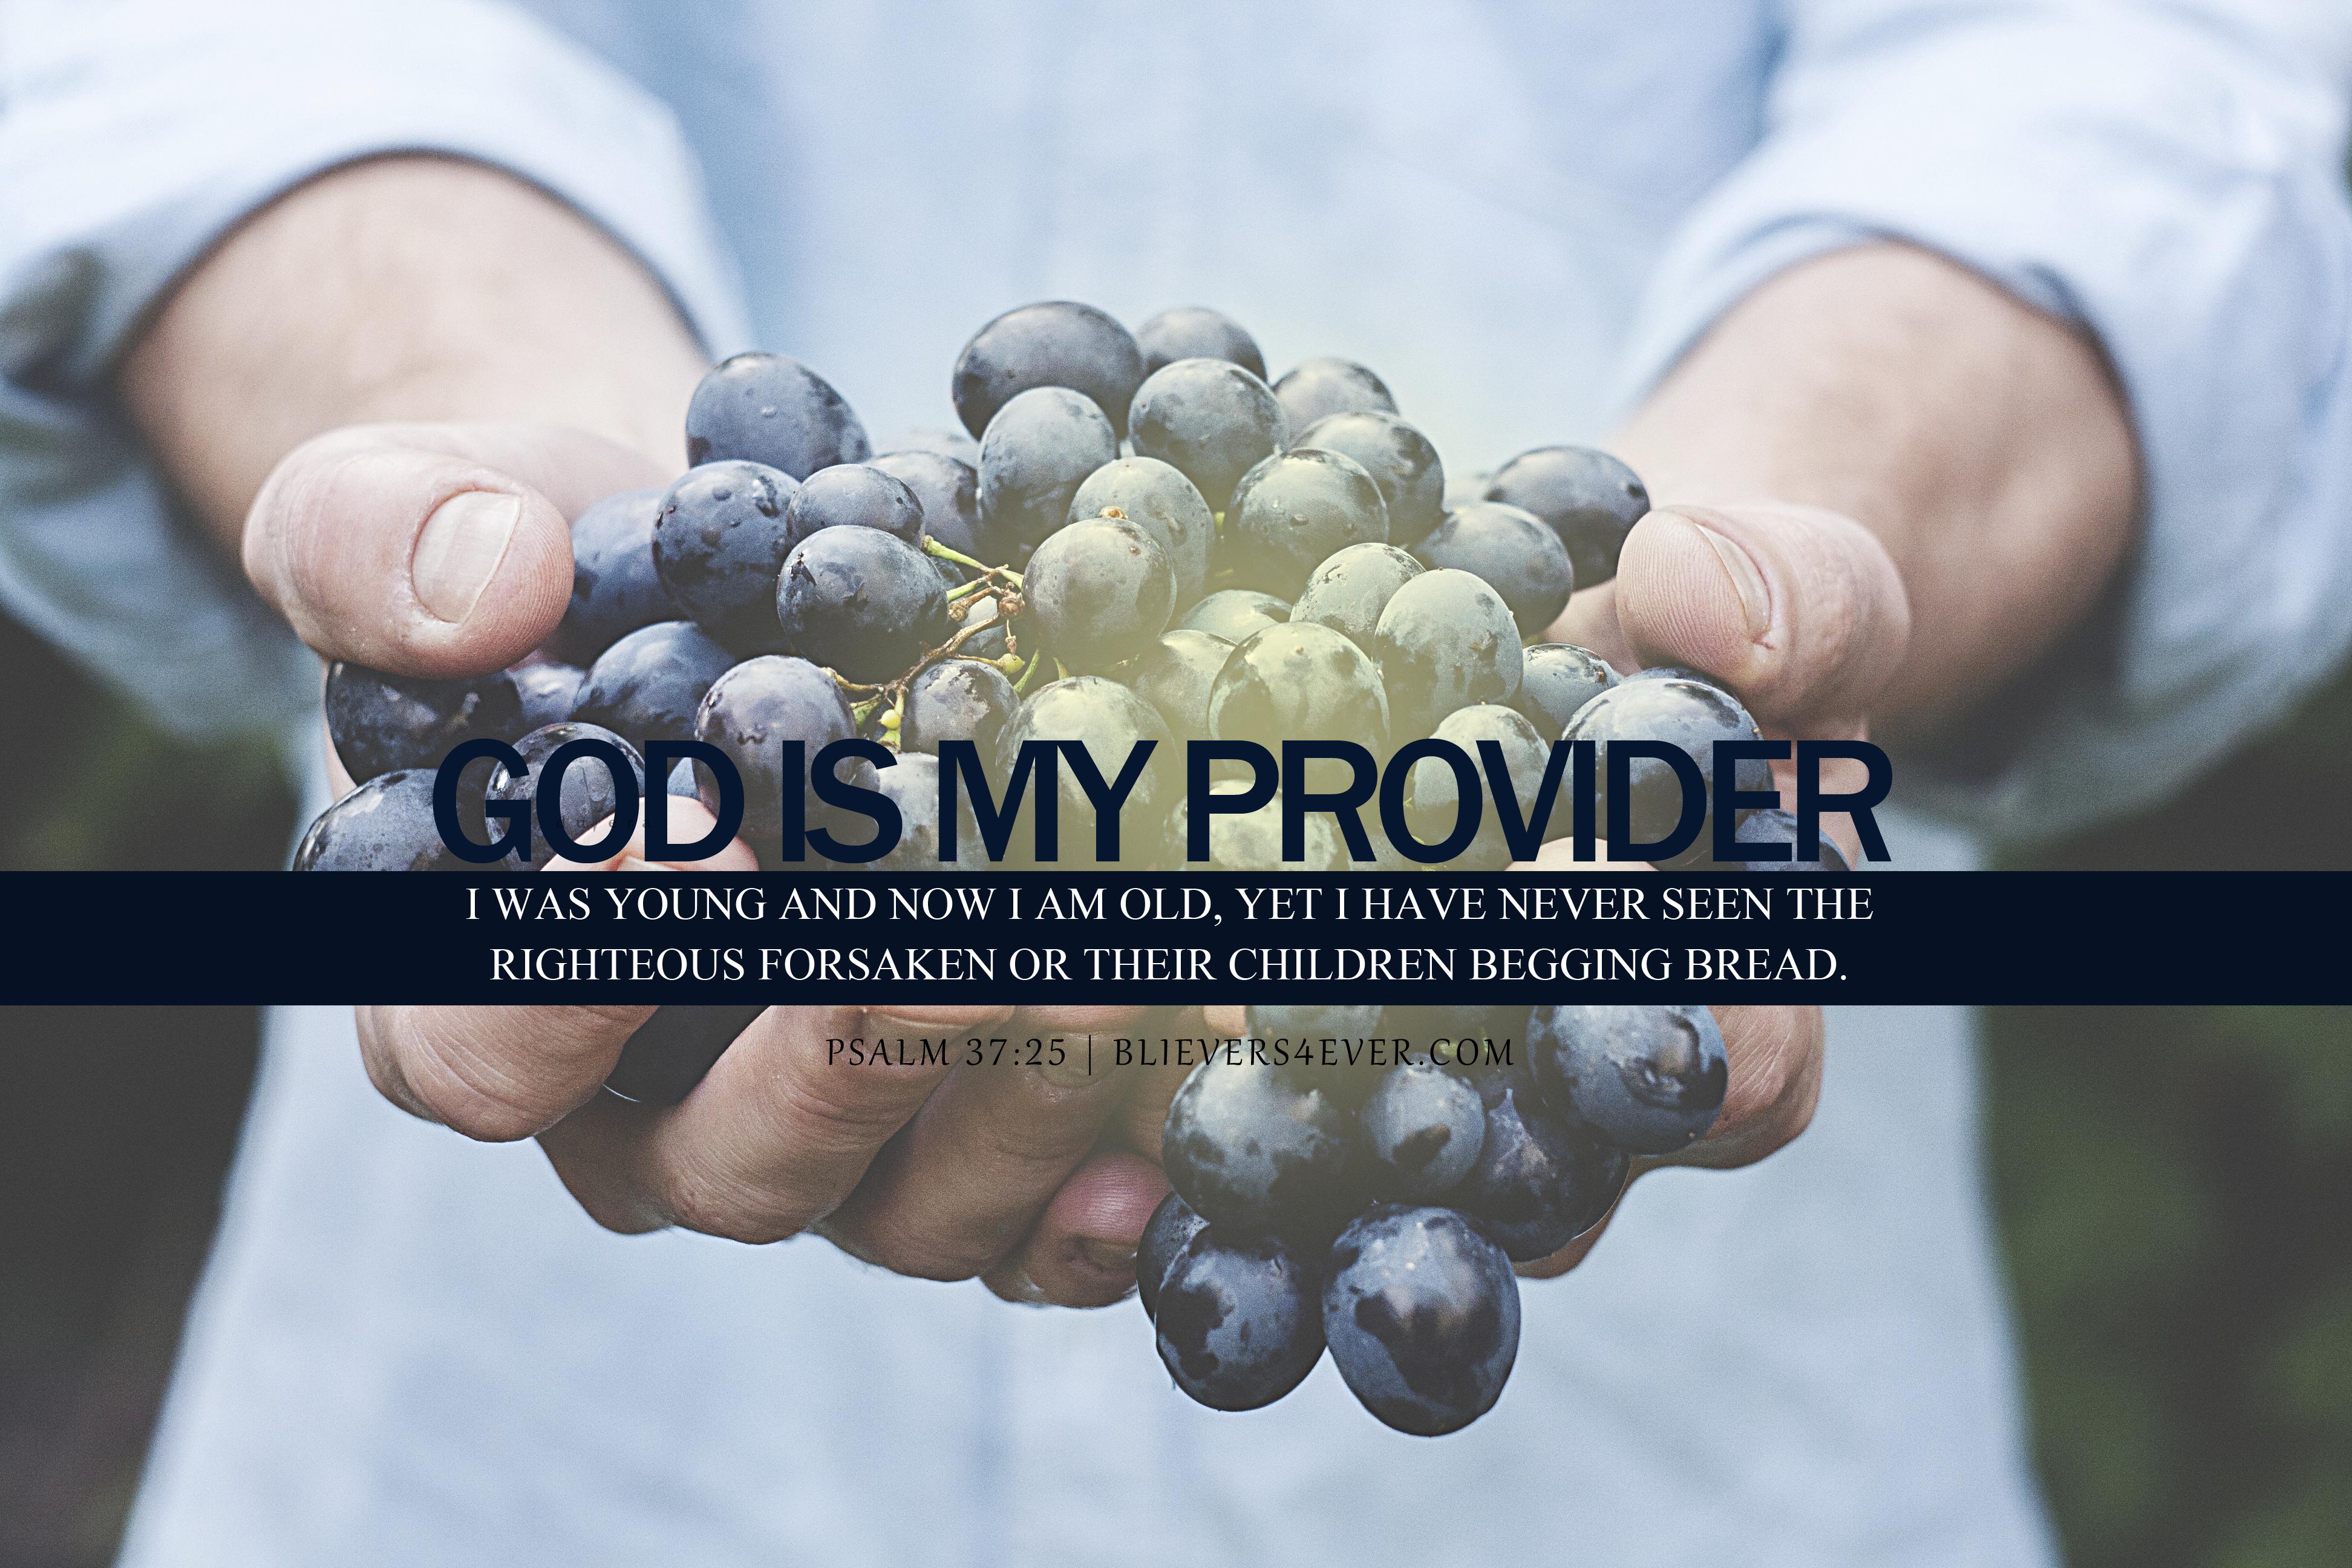 God is my provider desktop wallpaper for church background